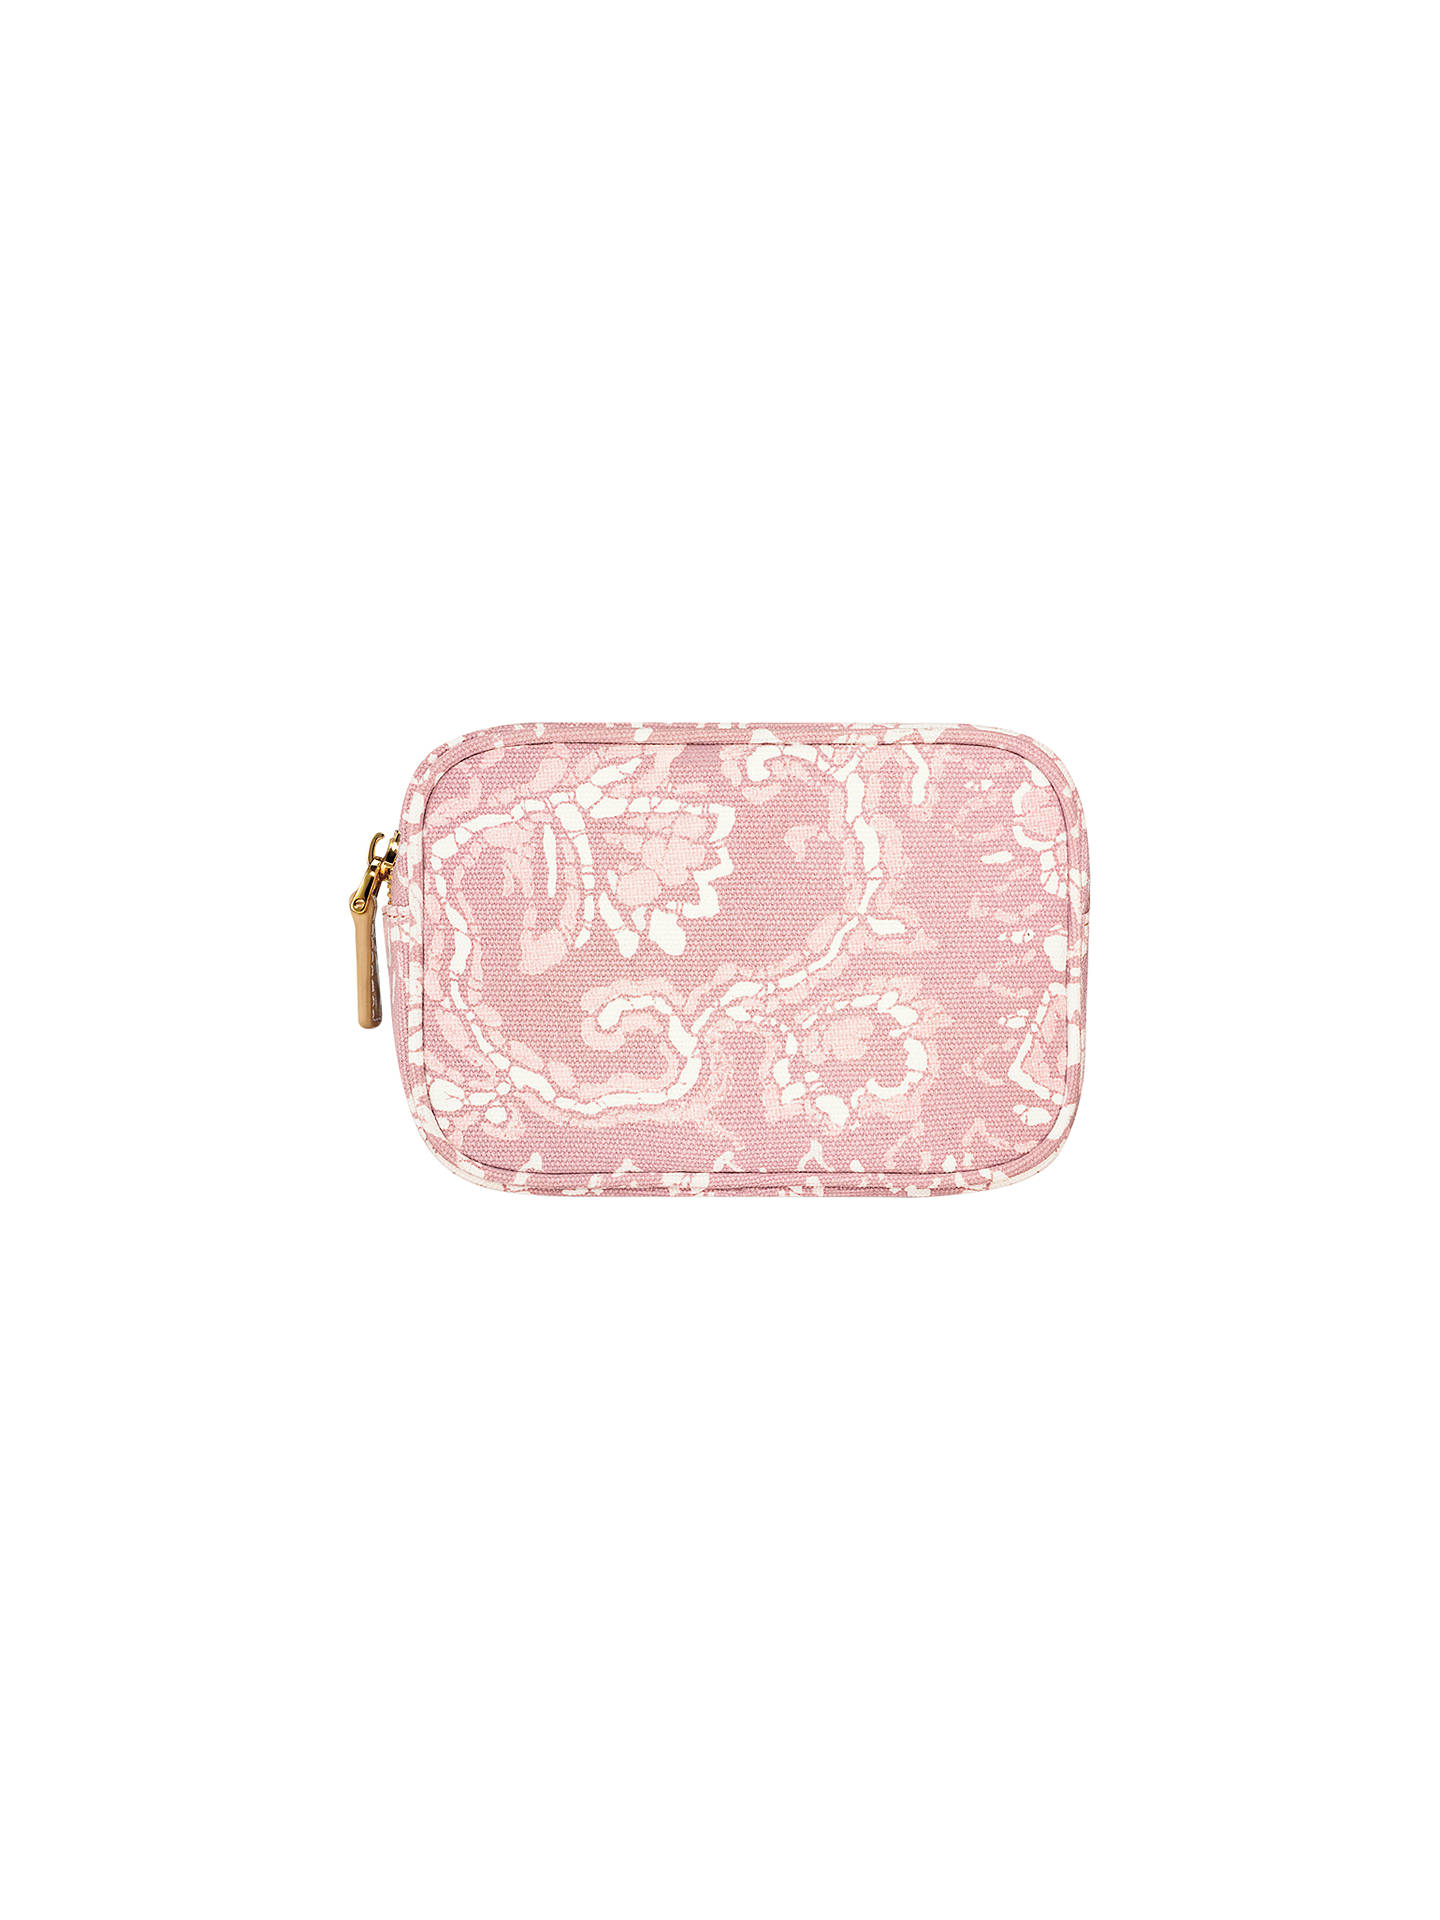 Aerin Essentials Makeup Bag Pink At